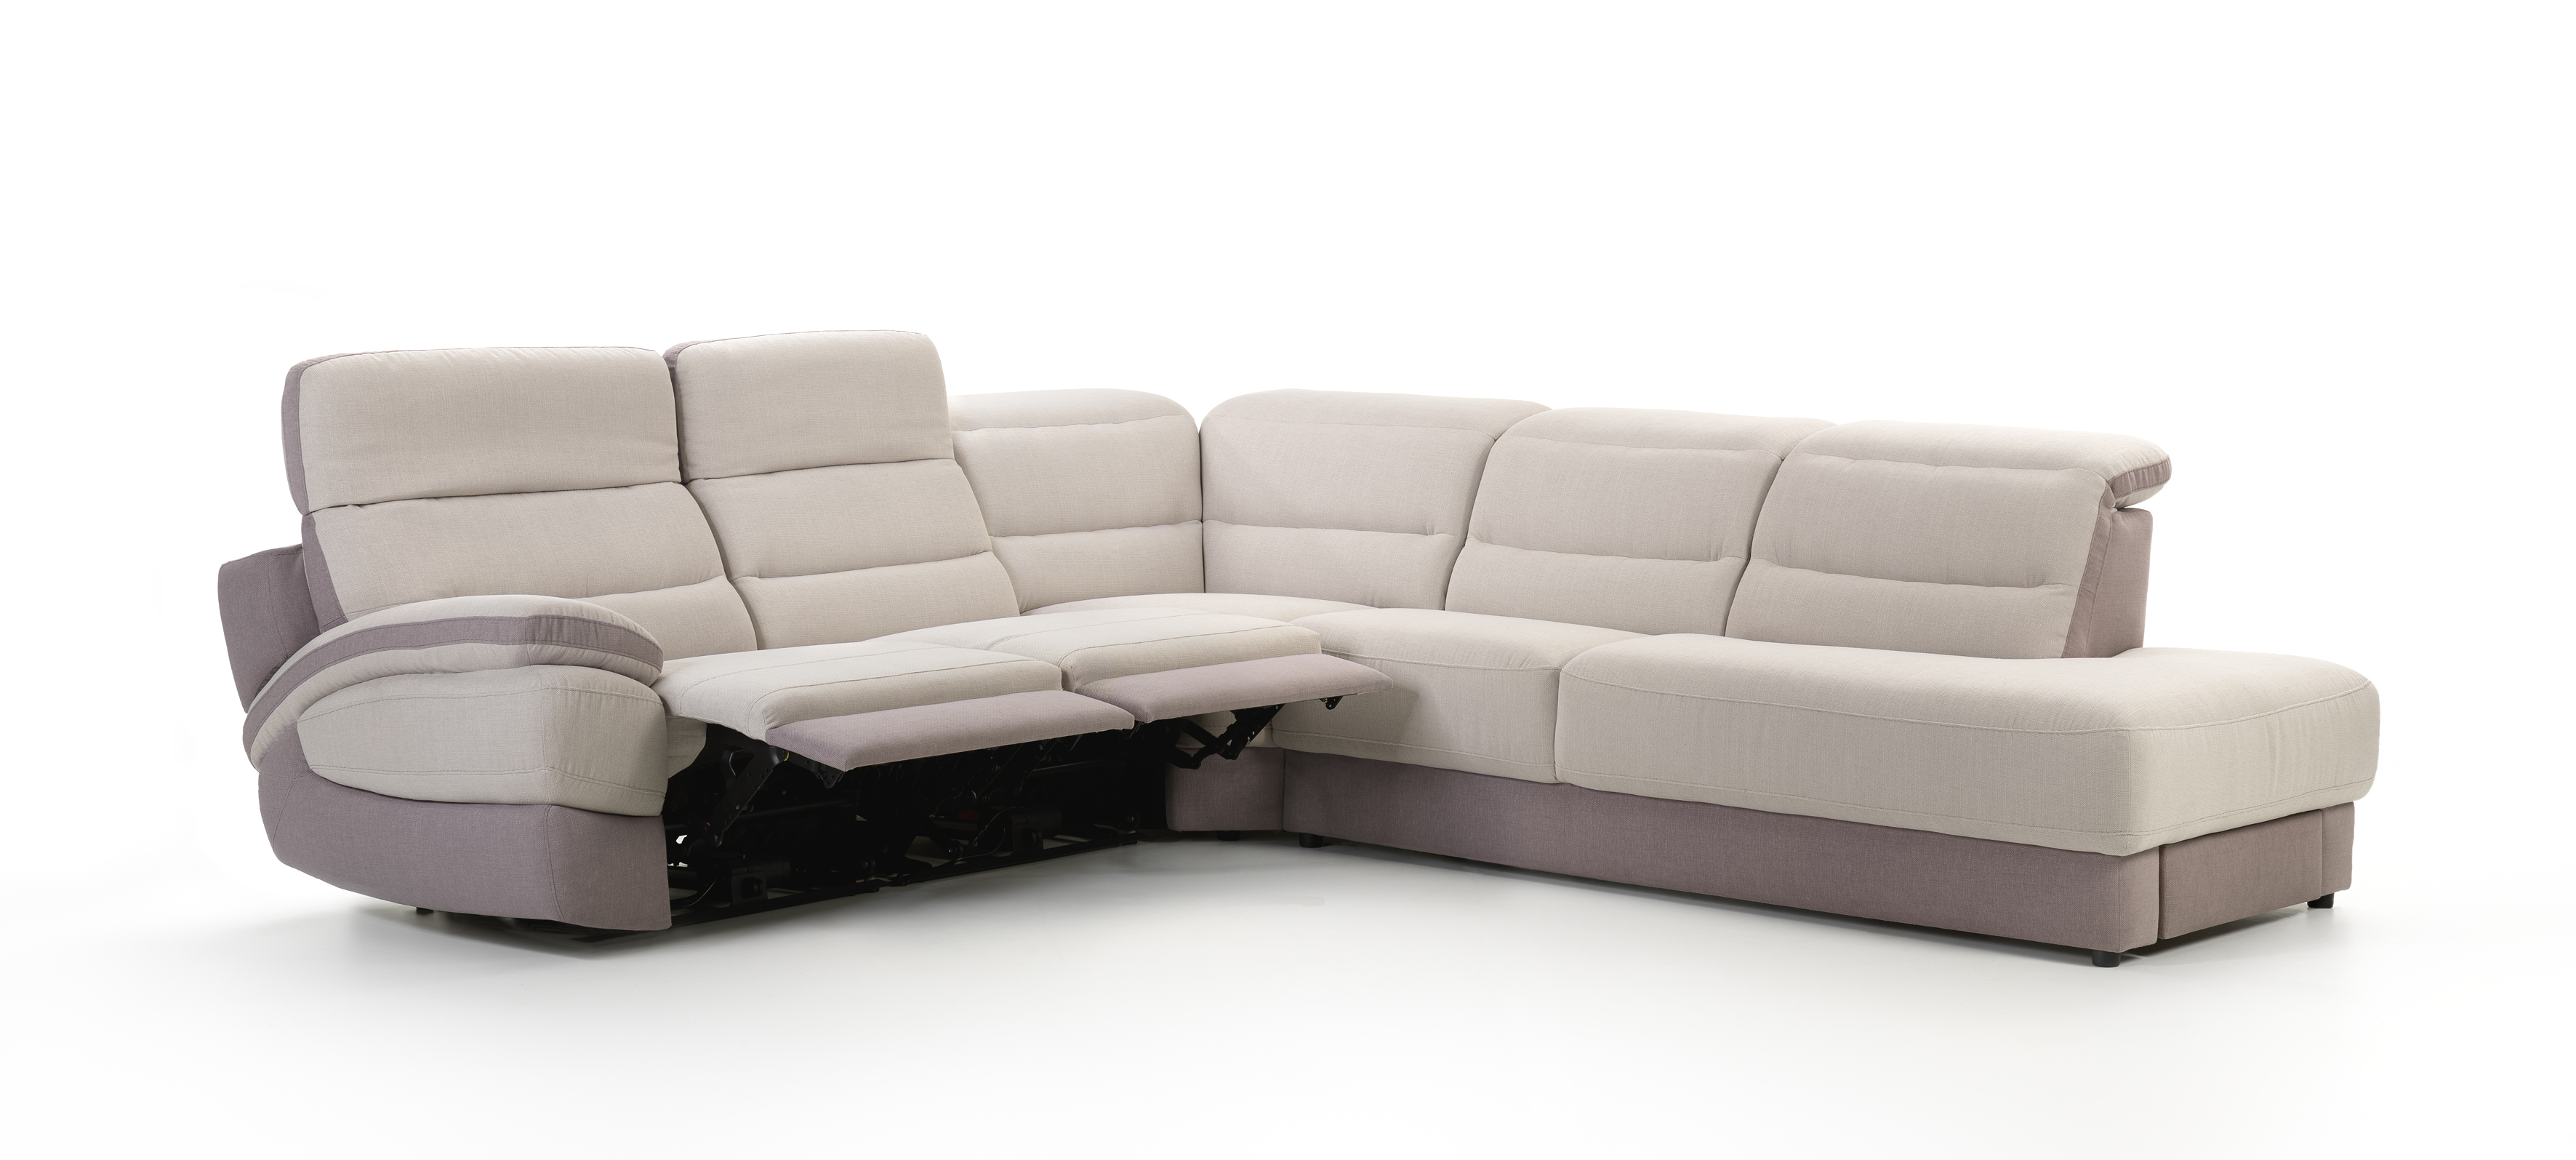 Ol ron meubles balmoral ol ron meubles for Meubles oleron